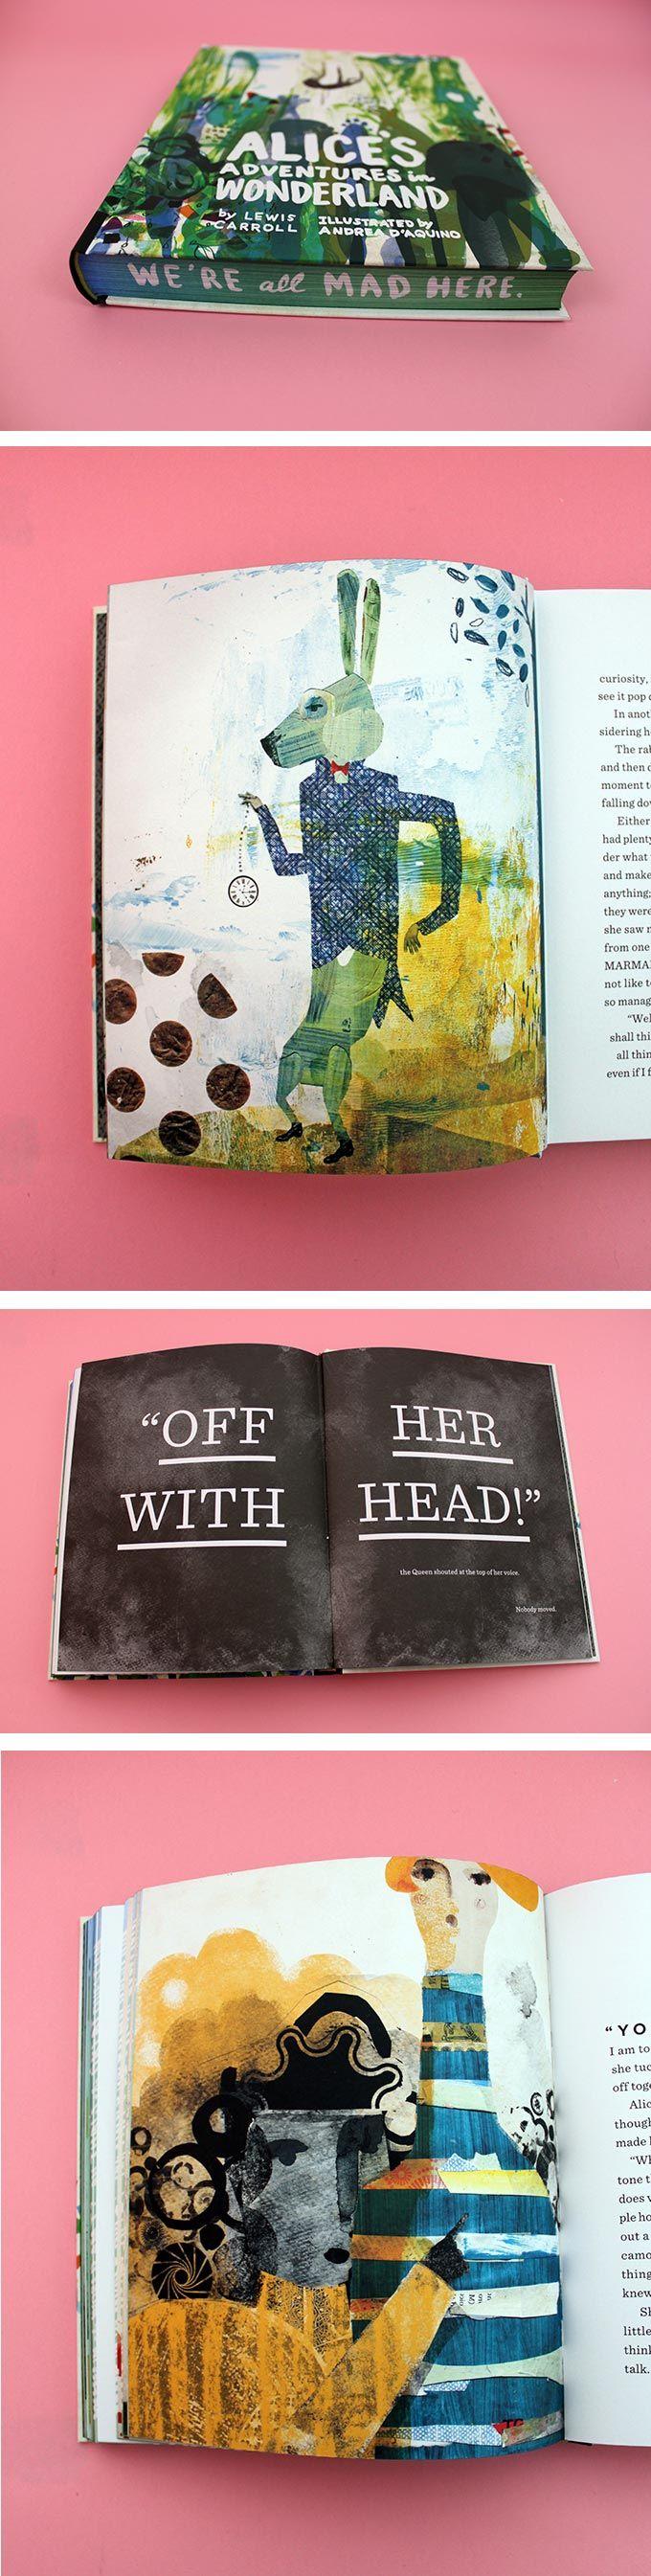 Andrea D'Aquino puts a contemporary spin on 'Alice's Adventures in Wonderland'